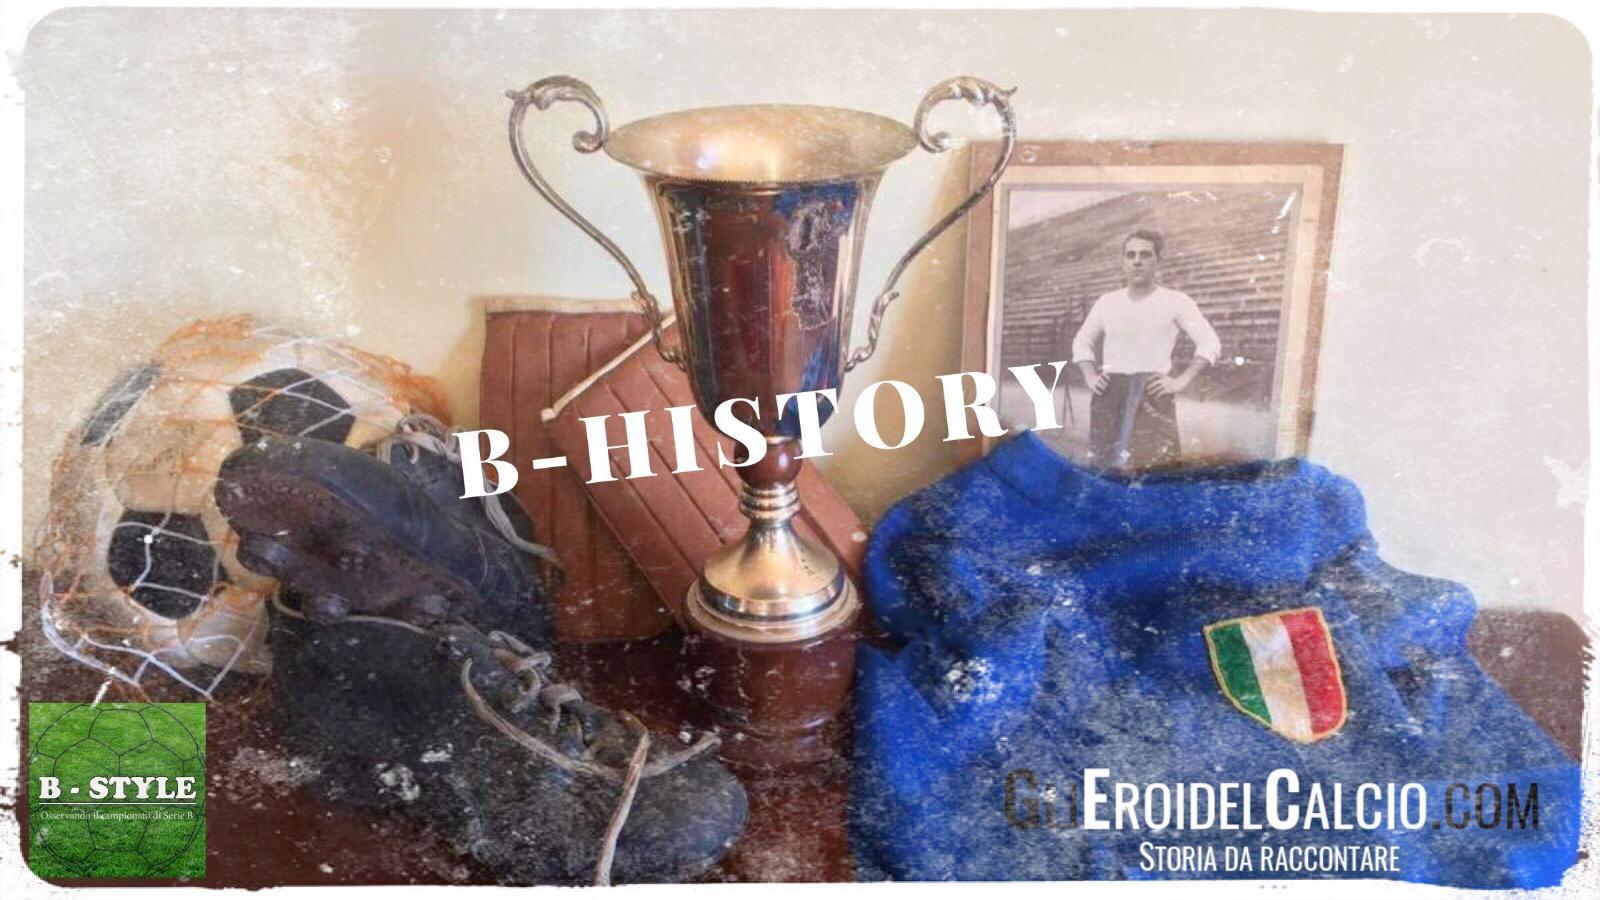 B-History